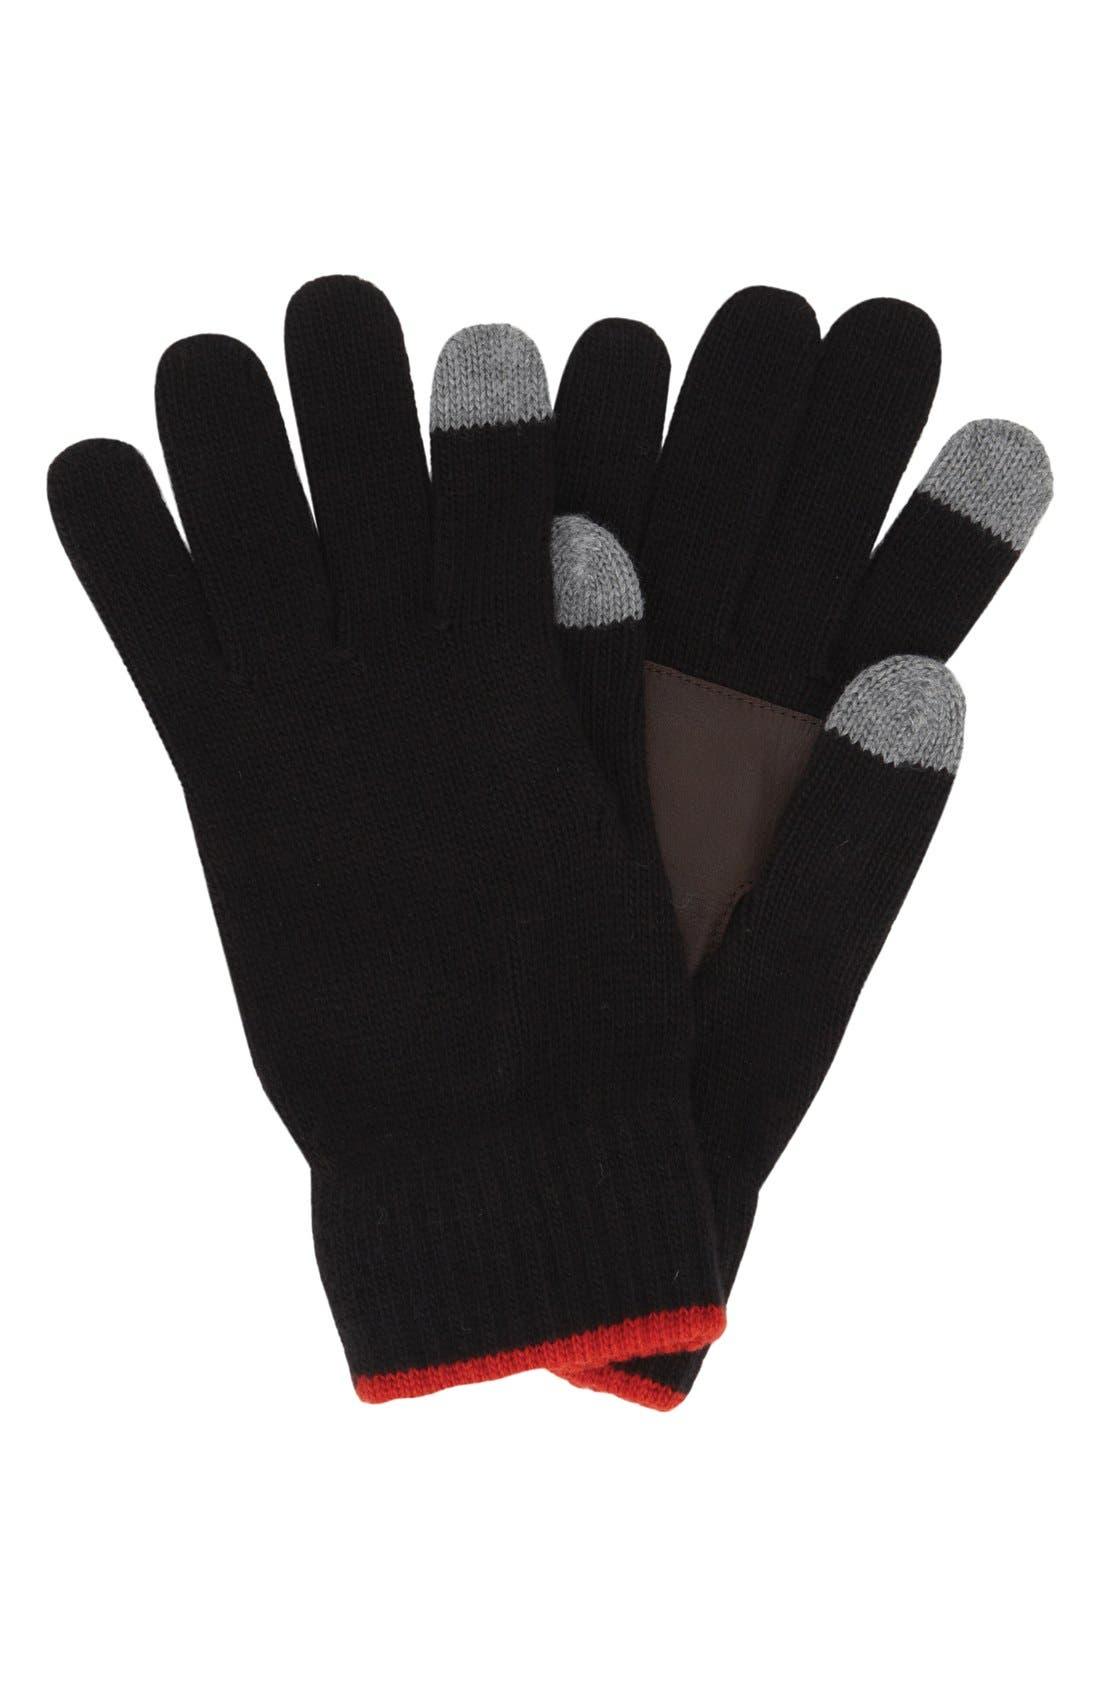 Alternate Image 1 Selected - Original Penguin 'Bordwell' Knit Gloves